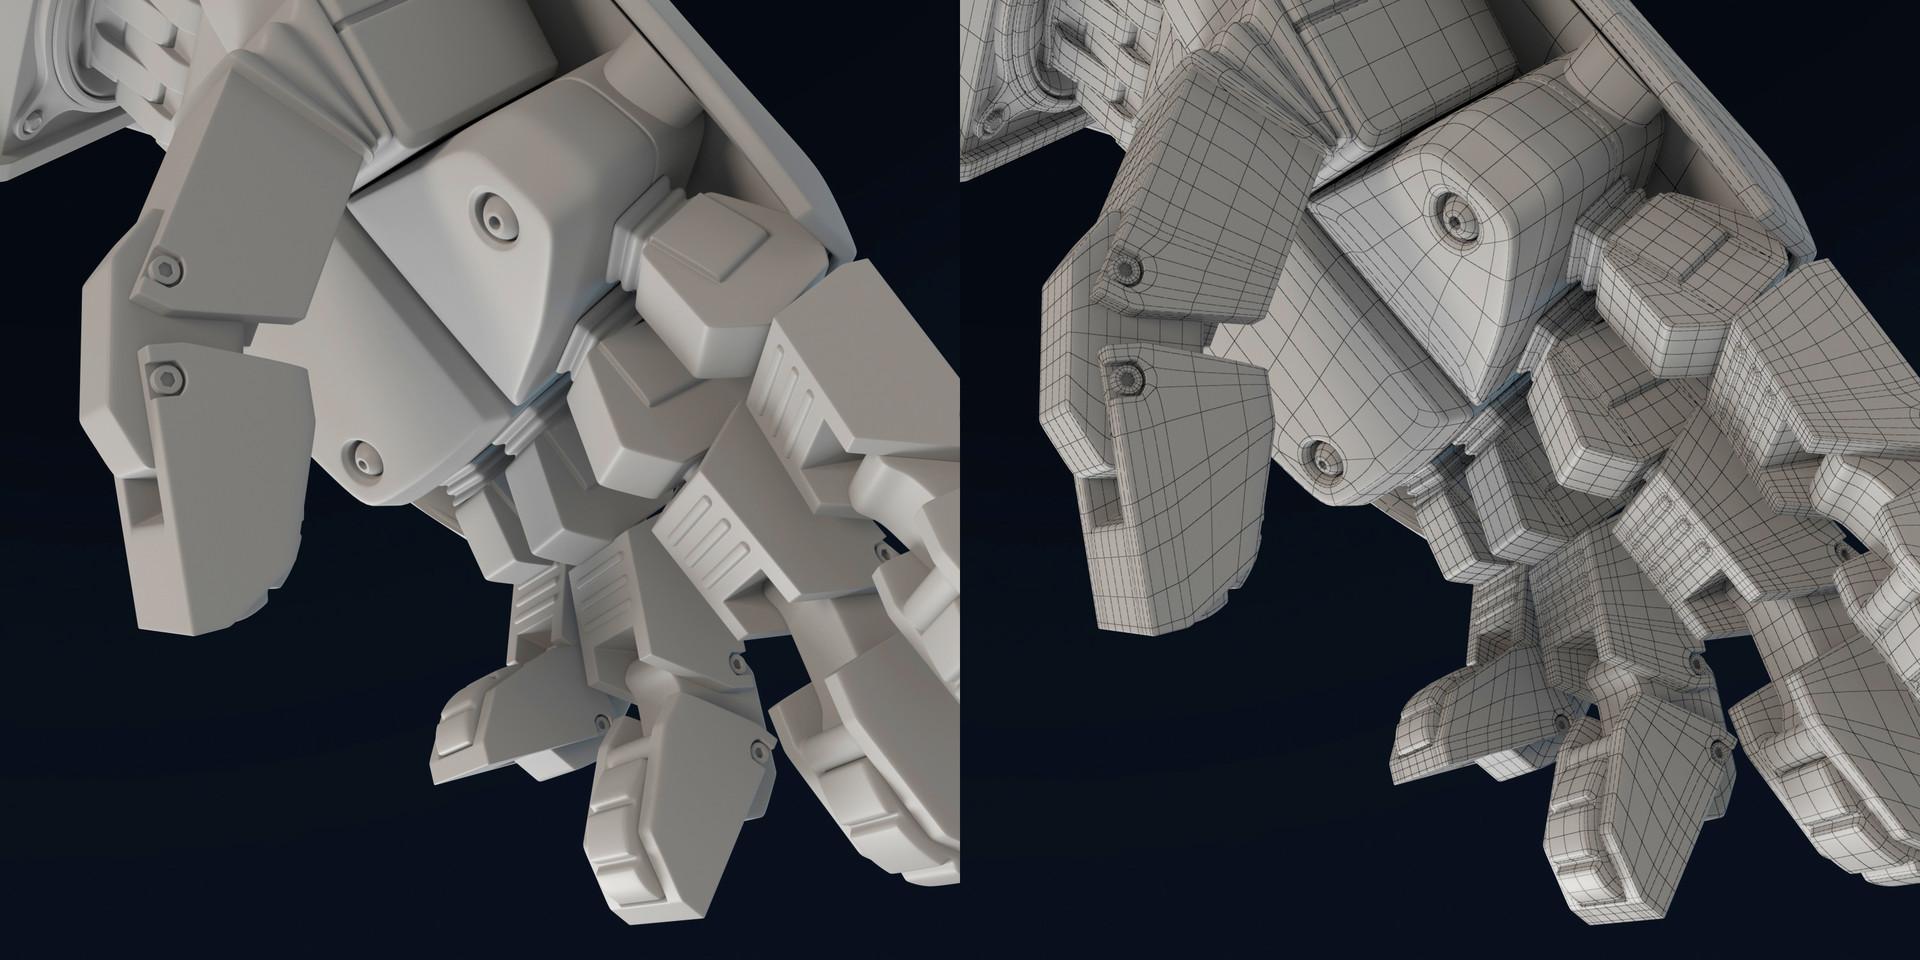 ArtStation - BIONIC ARM - Modeling, Jaime Chinchilla